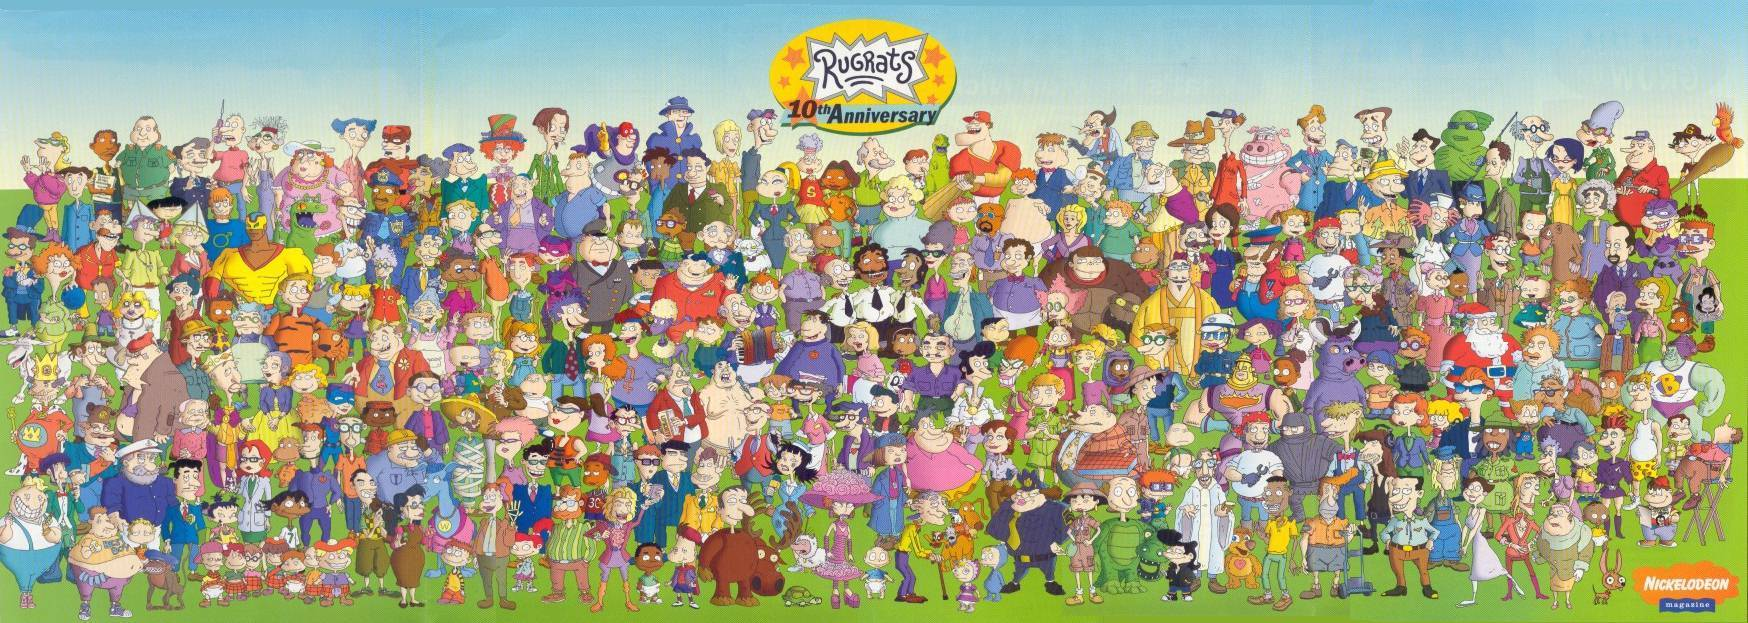 Rugrats World